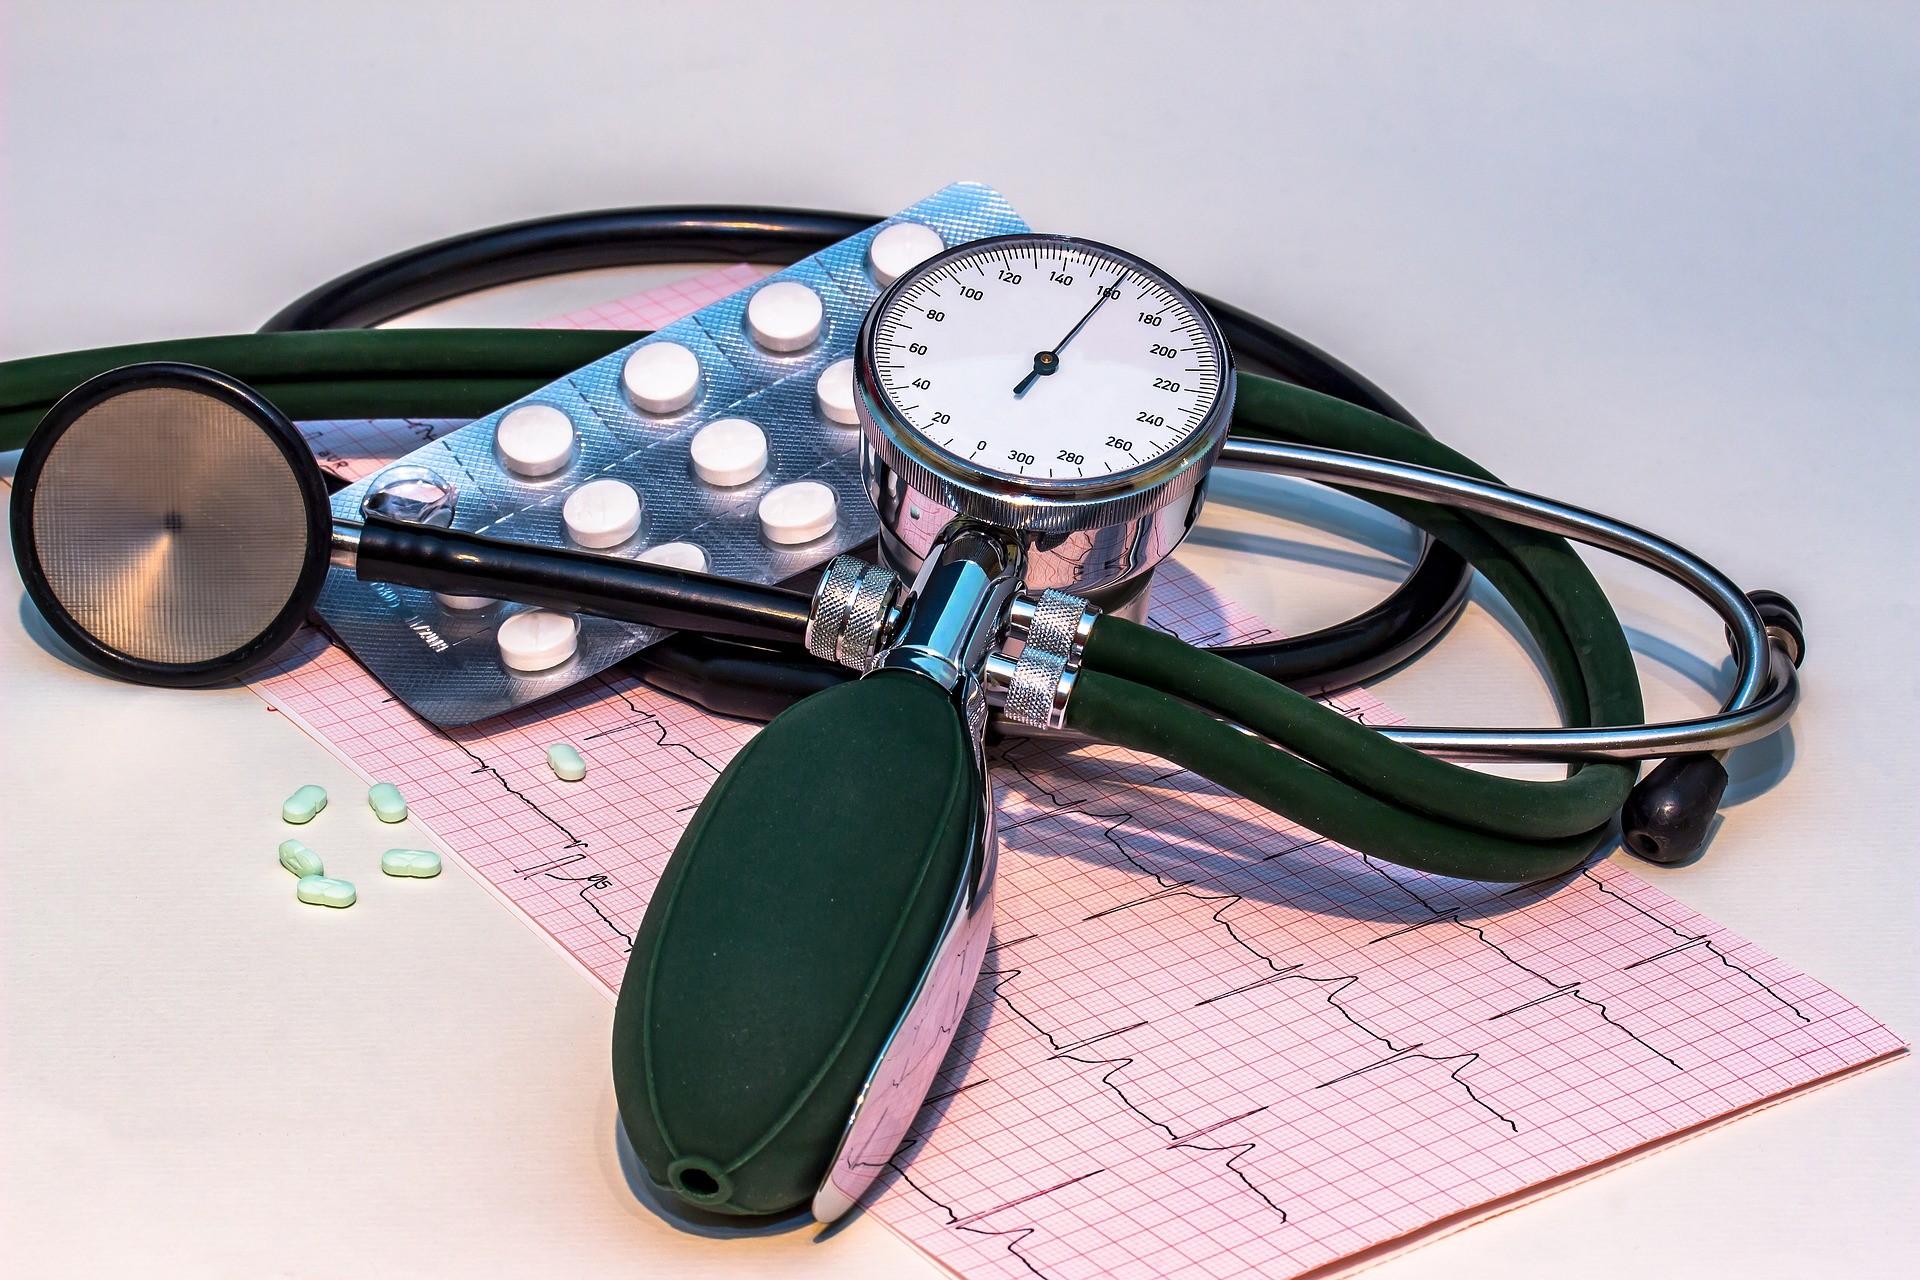 sergant hipertenzija, vartojami vaistai)